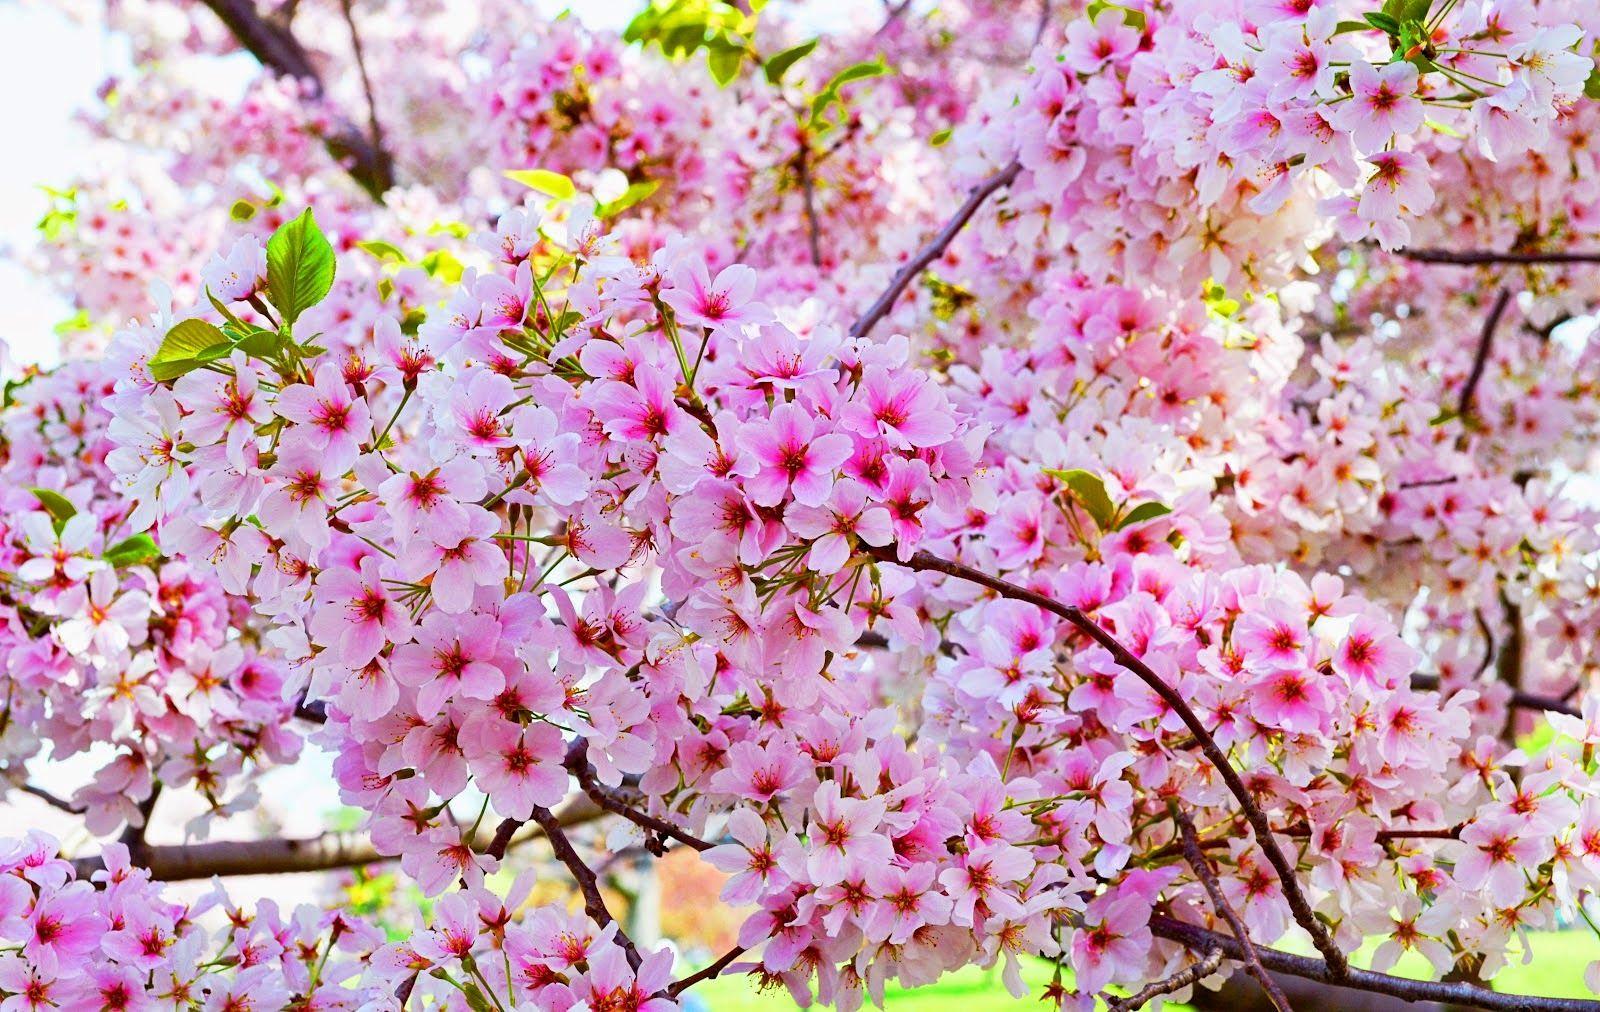 Gambar Bunga Sakura Berjatuhan (Dengan gambar) Bunga